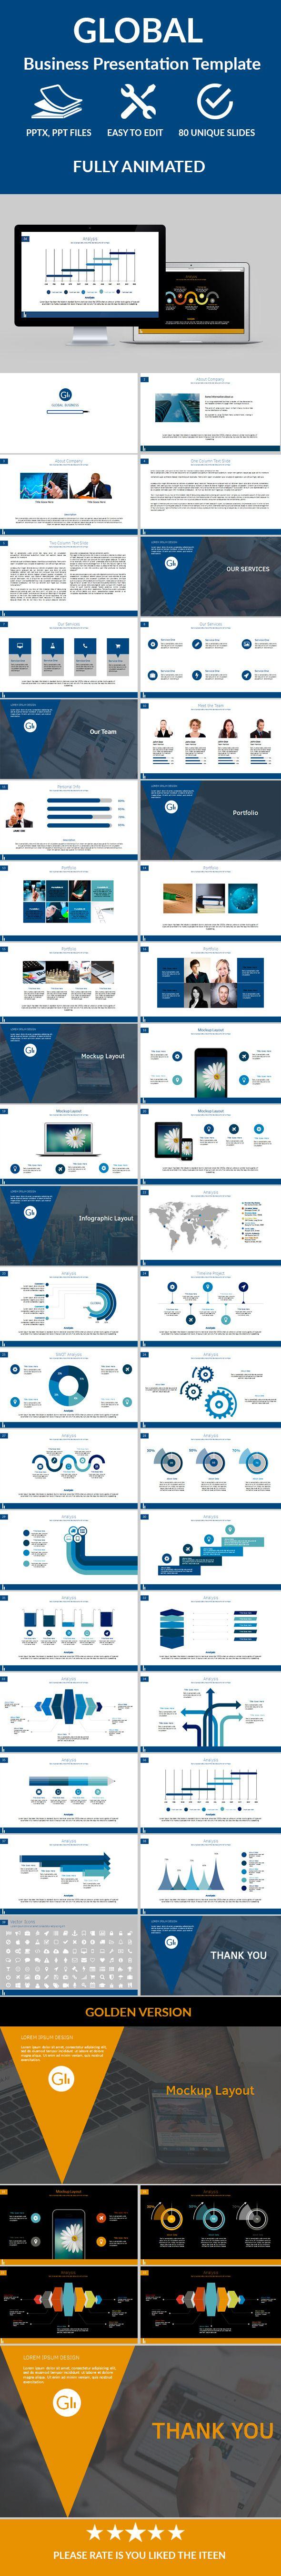 Global Business Powerpoint Presentation Template #design #slides Download: http://graphicriver.net/item/global-business-powerpoint-presentation/12249661?ref=ksioks